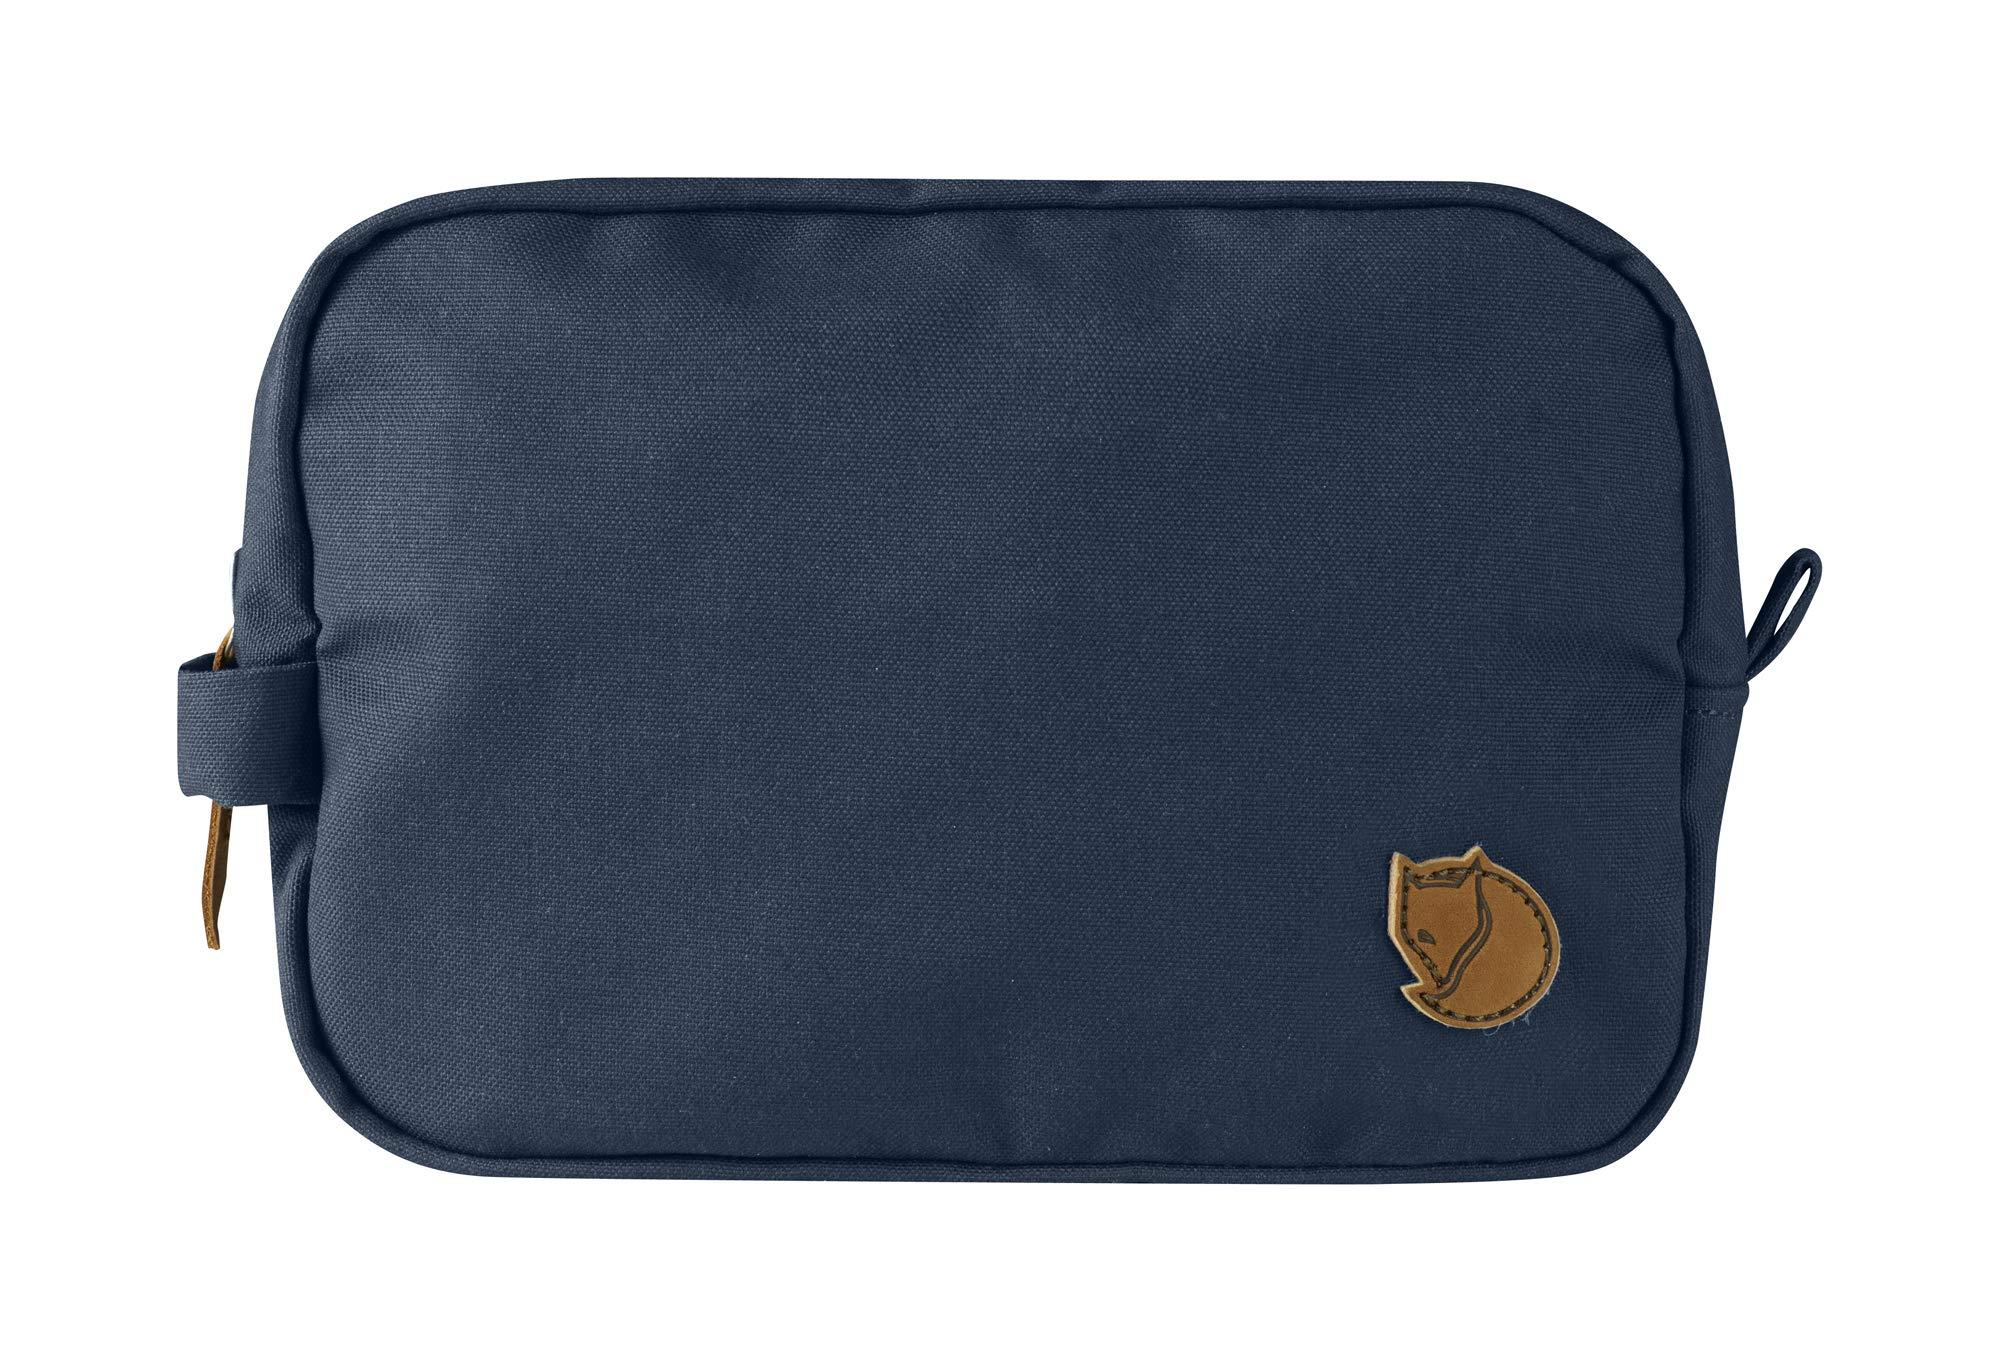 Fjallraven - Gear Bag, Navy by Fjallraven